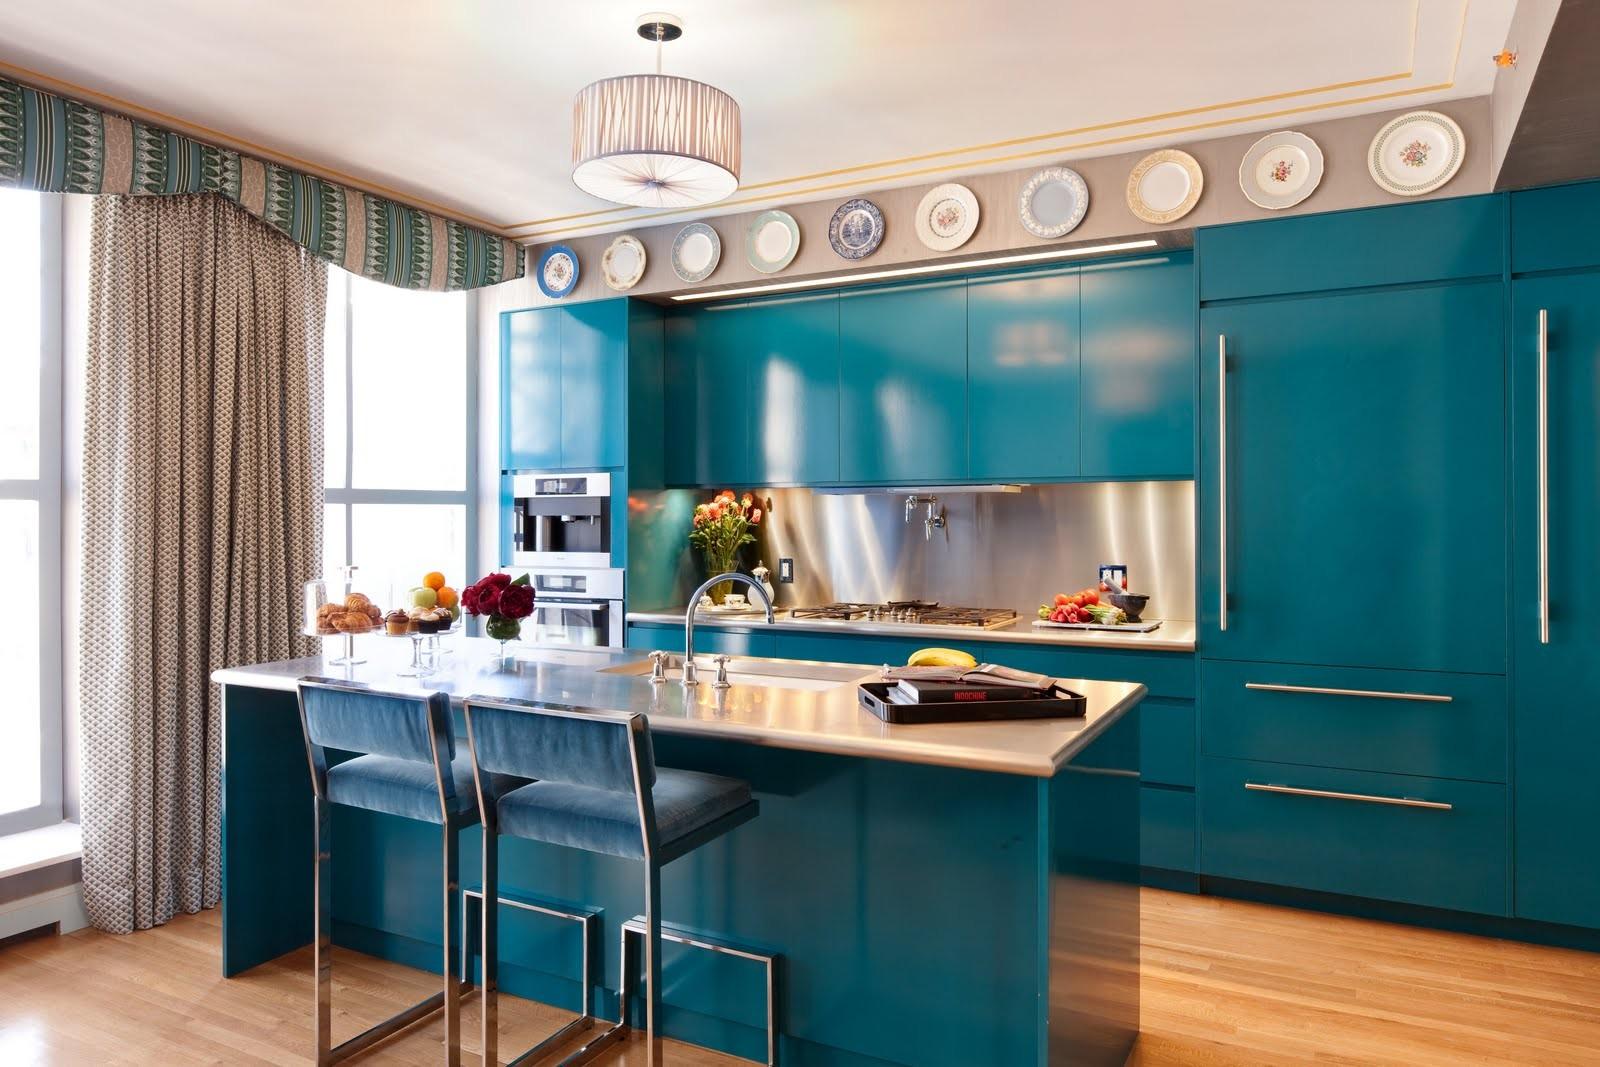 mutfak-dekorasyon.hpg